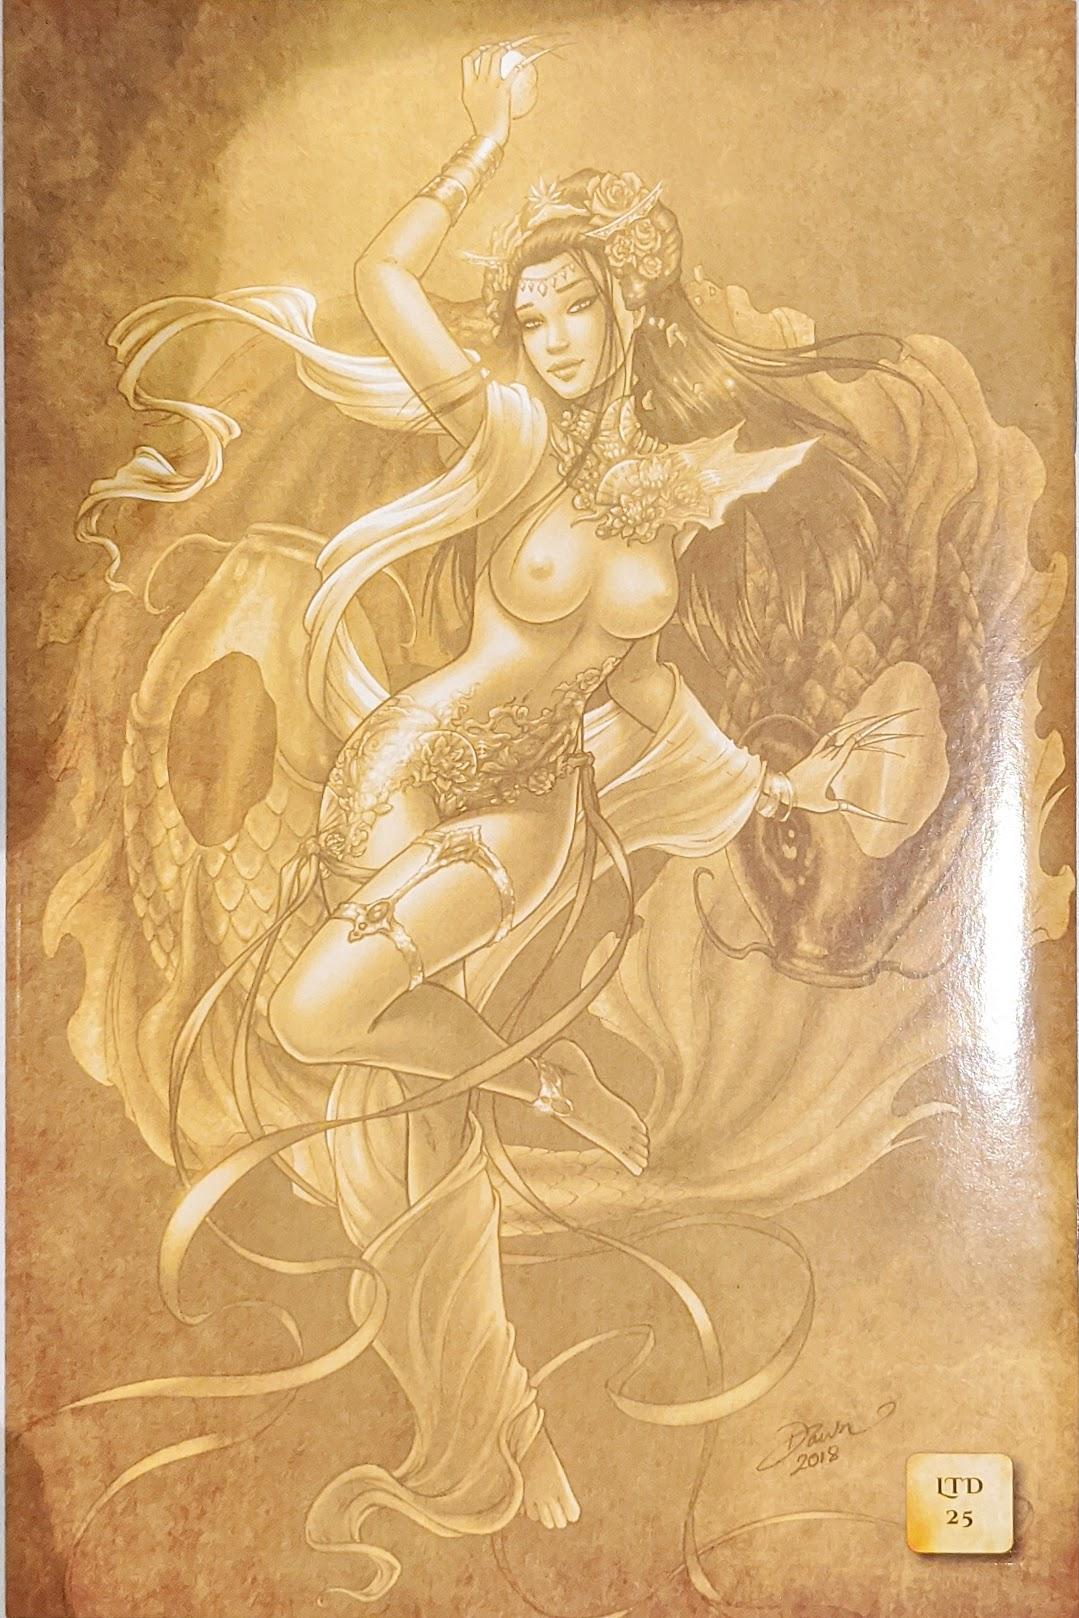 Divinica #4 Dawn McTeigue Gold Risque Variant LTD To 25